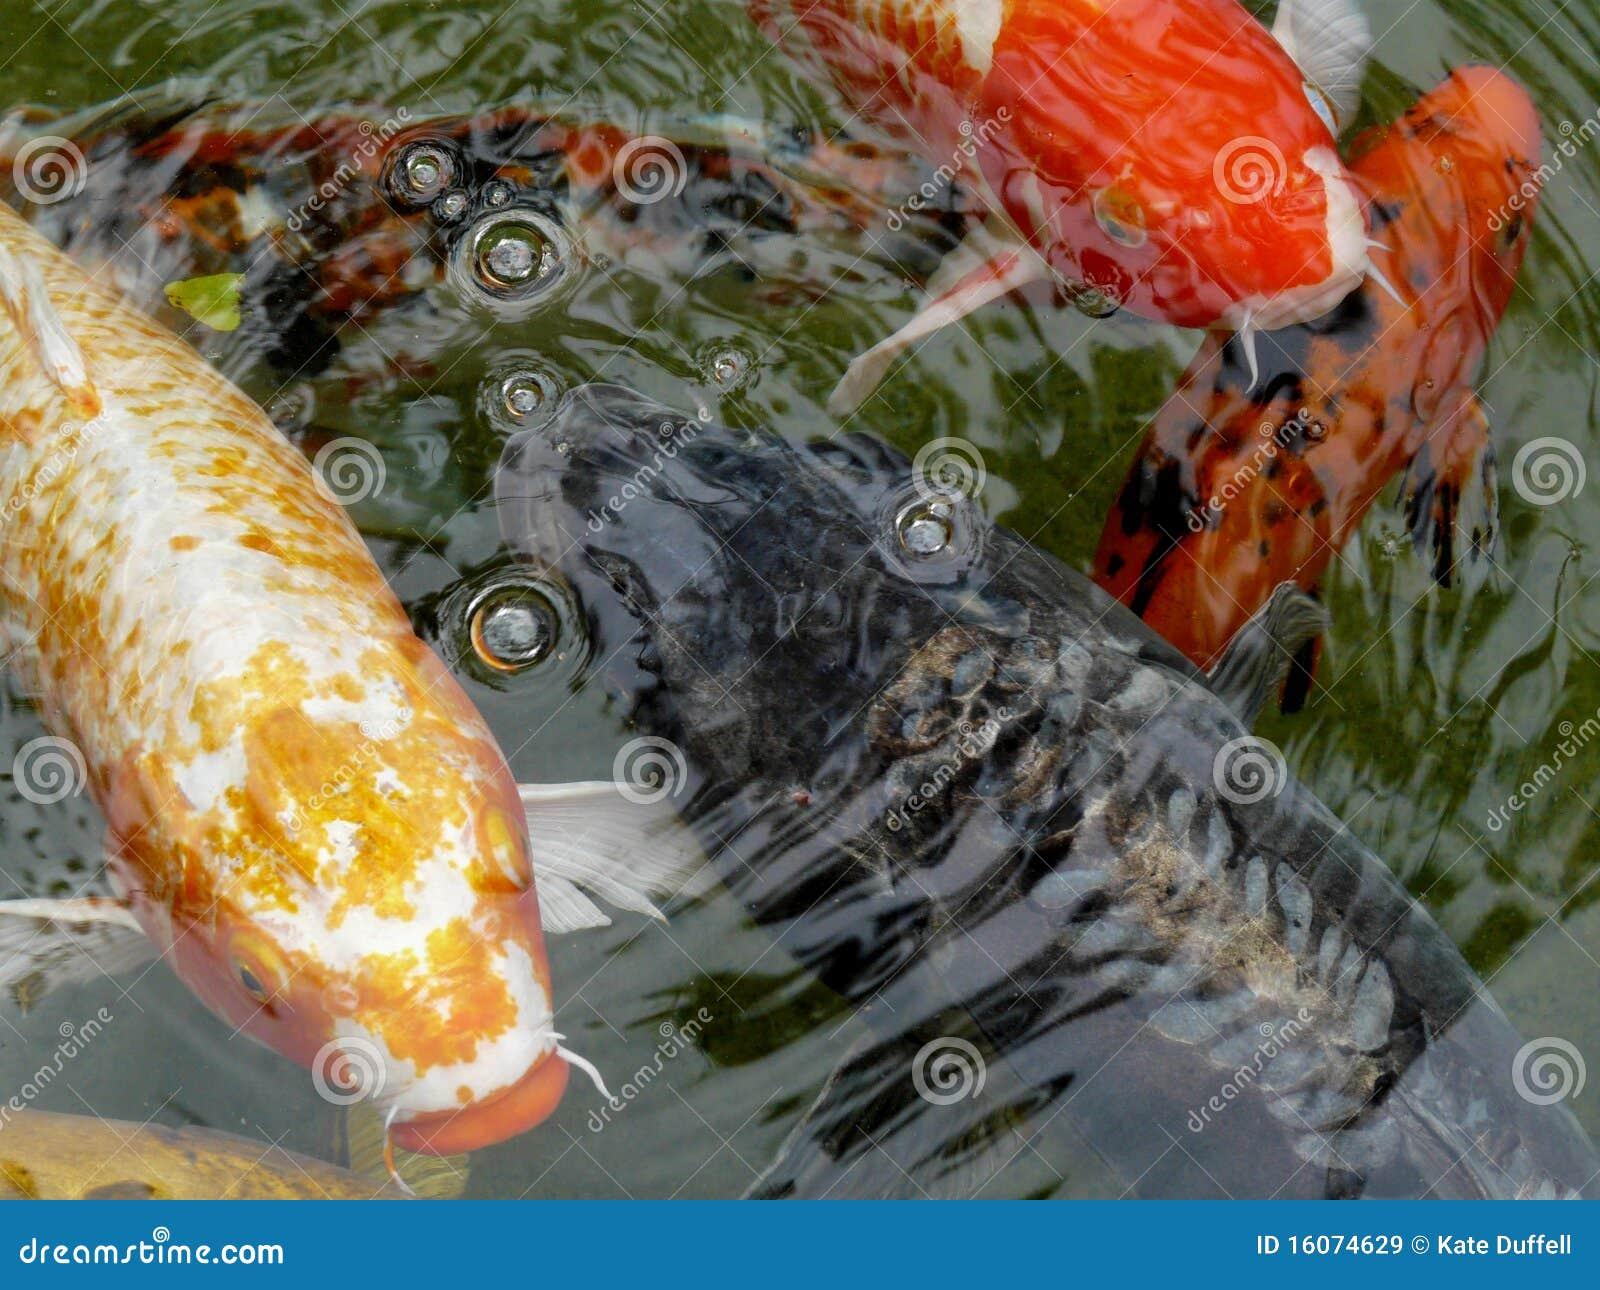 Ornamental koi carp fish royalty free stock images image for Ornamental pond fish